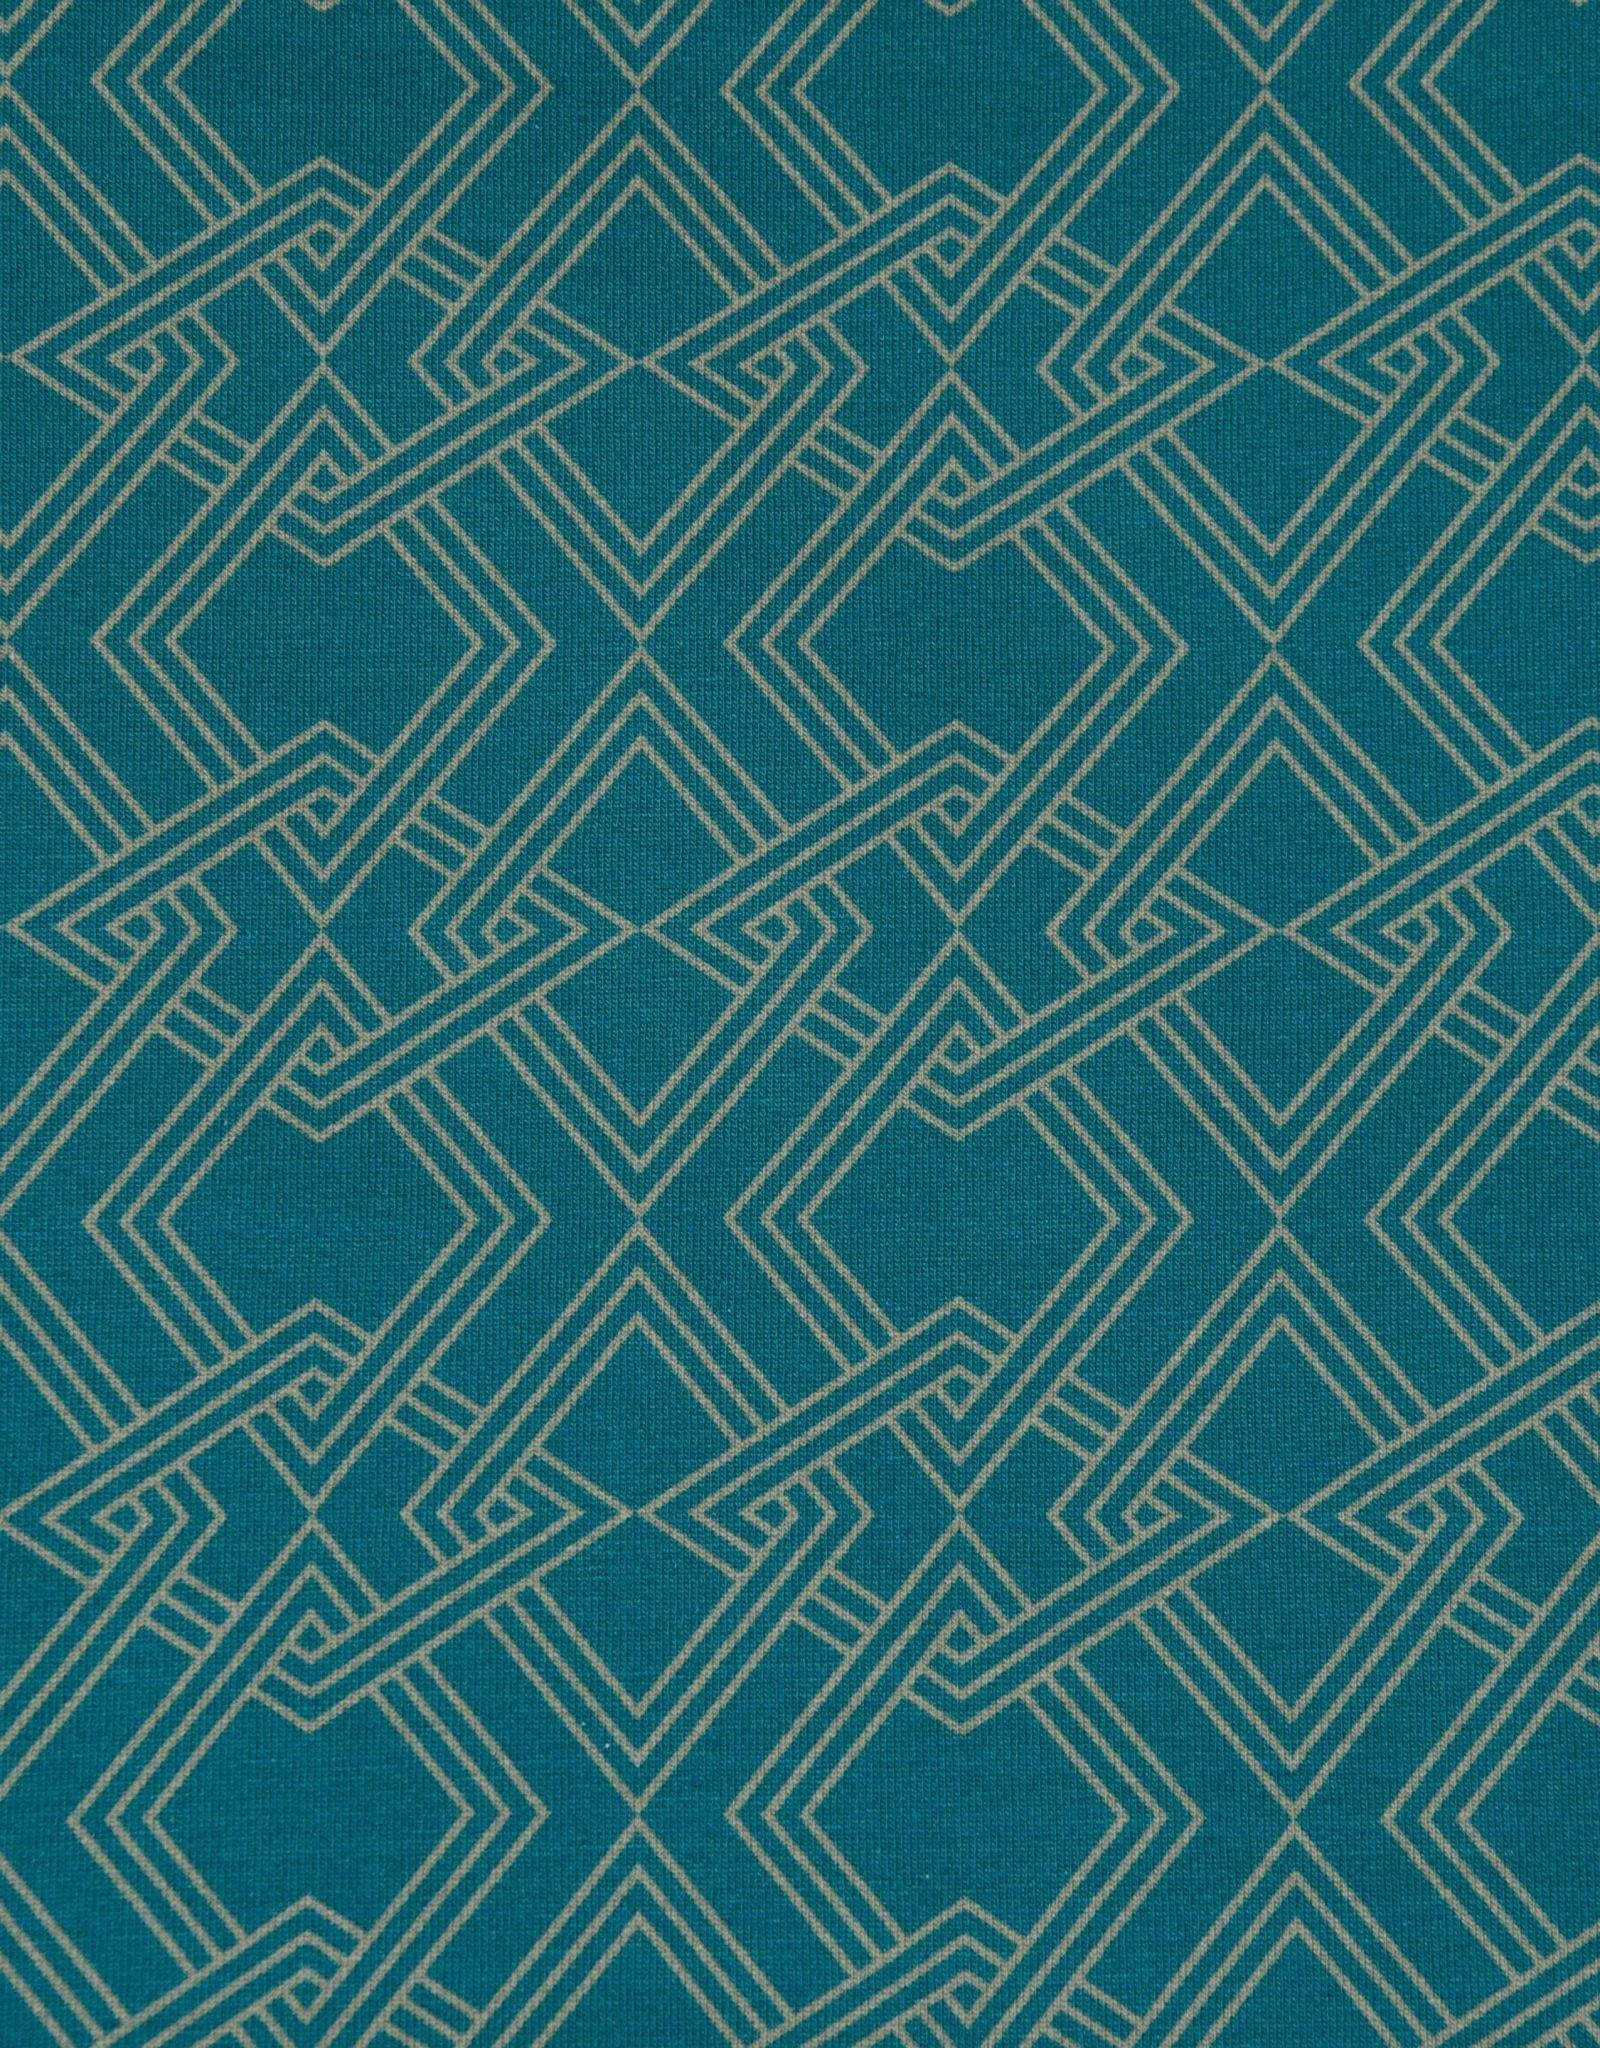 Hilco Triangle groen